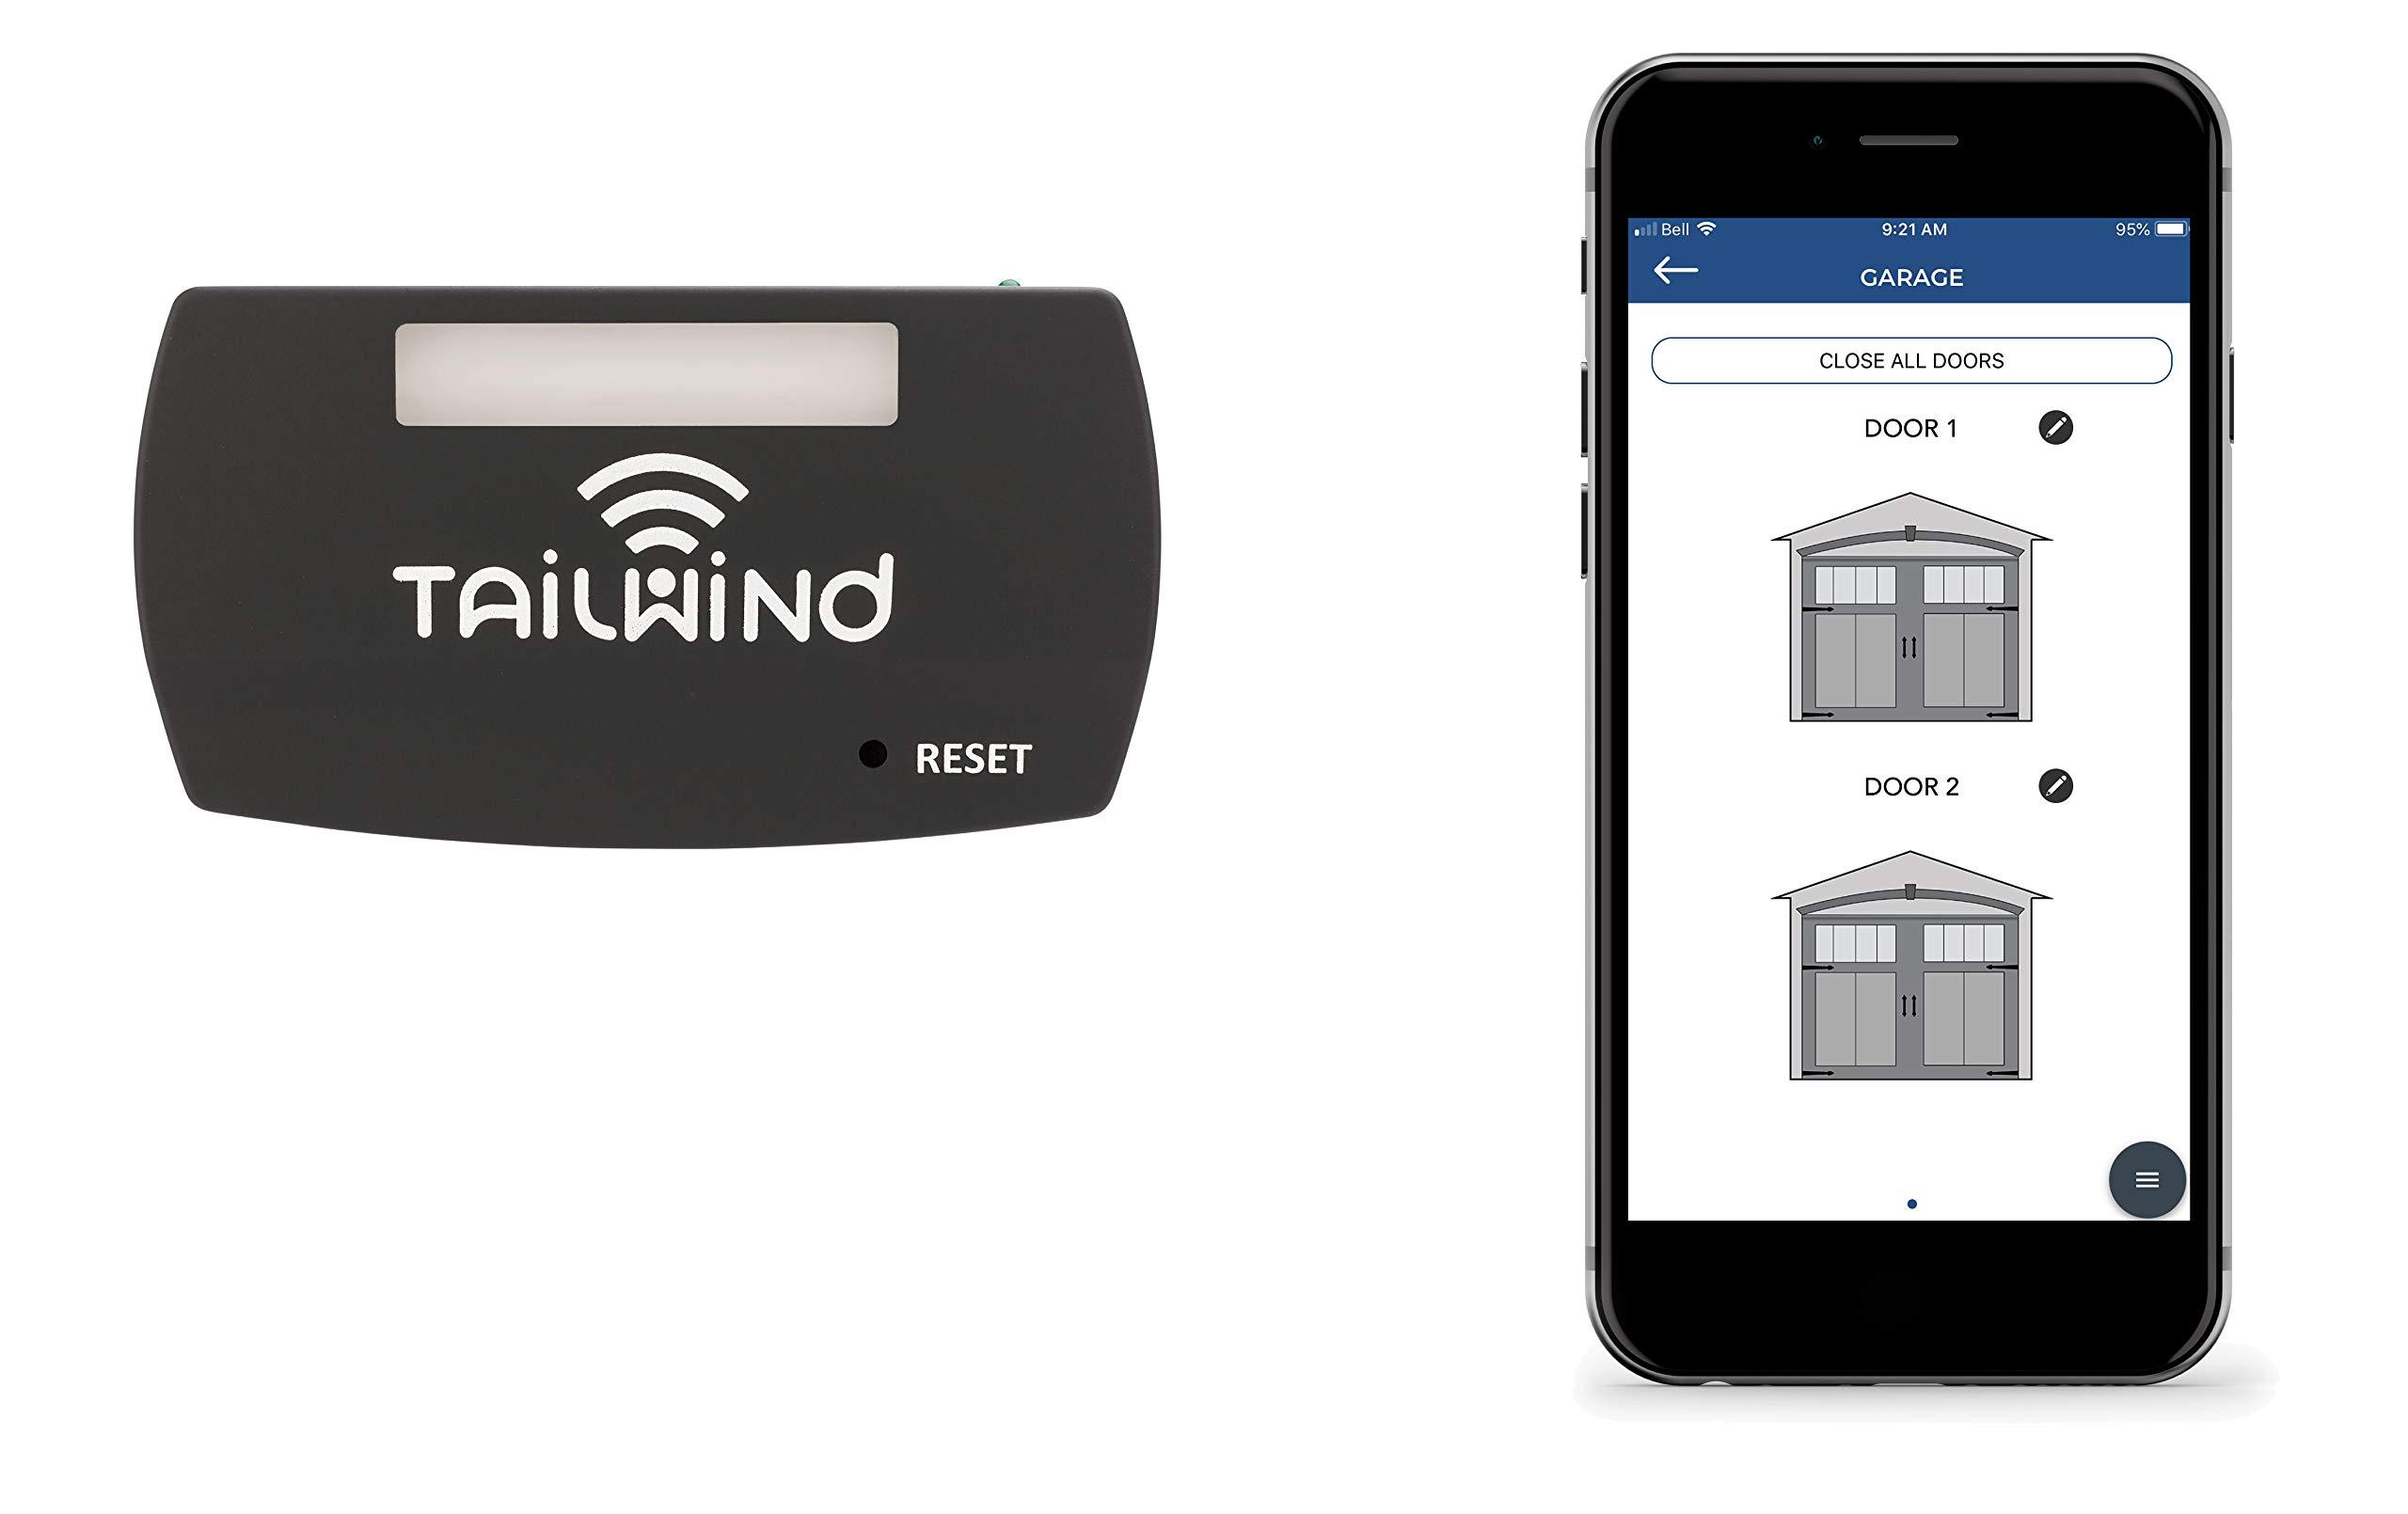 Tailwind iQ3 Smart WiFi Garage Door Opener - Internet Enabled Garage Door Remote Control Compatible with Your Smartphone, Alexa, Google Home, and Siri Shortcuts. Up to 3 Doors. by Tailwind